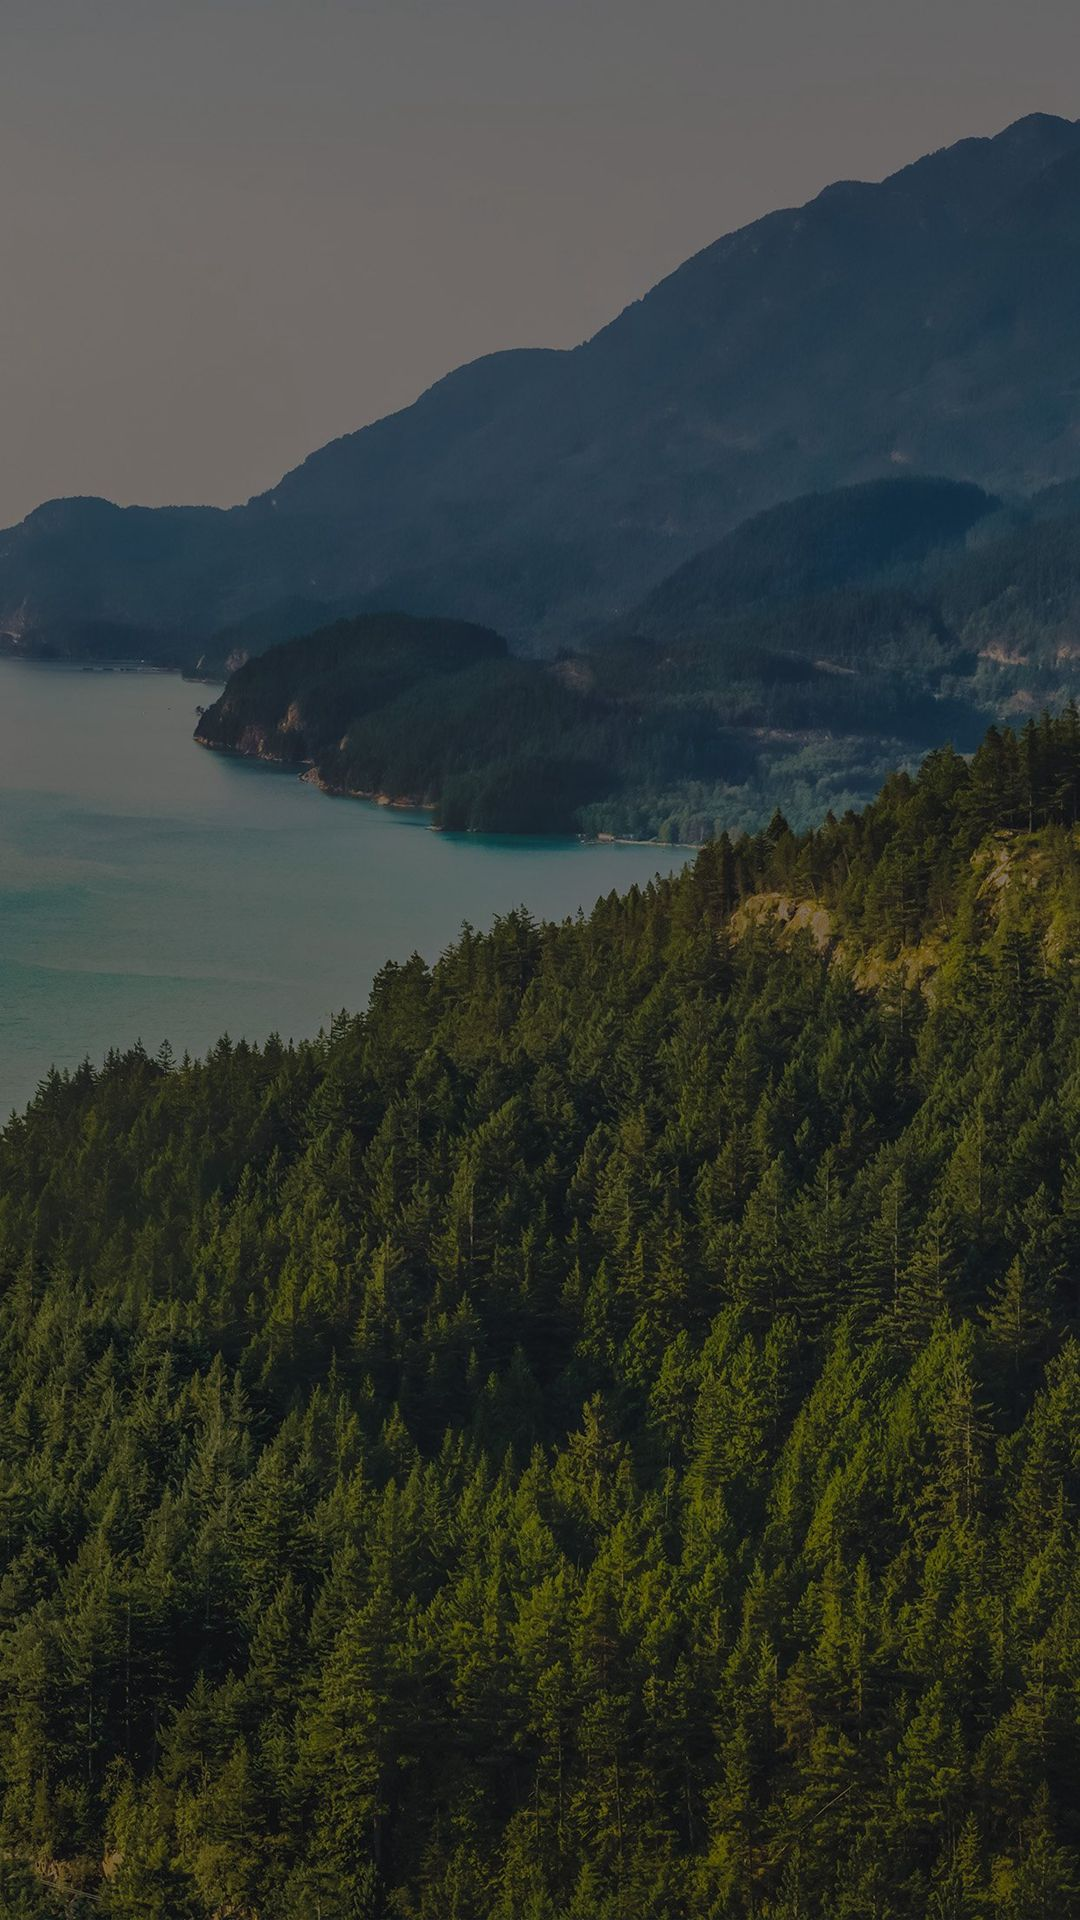 Lake Green Nature Wonderful Blue Summer Day Mountain Dark